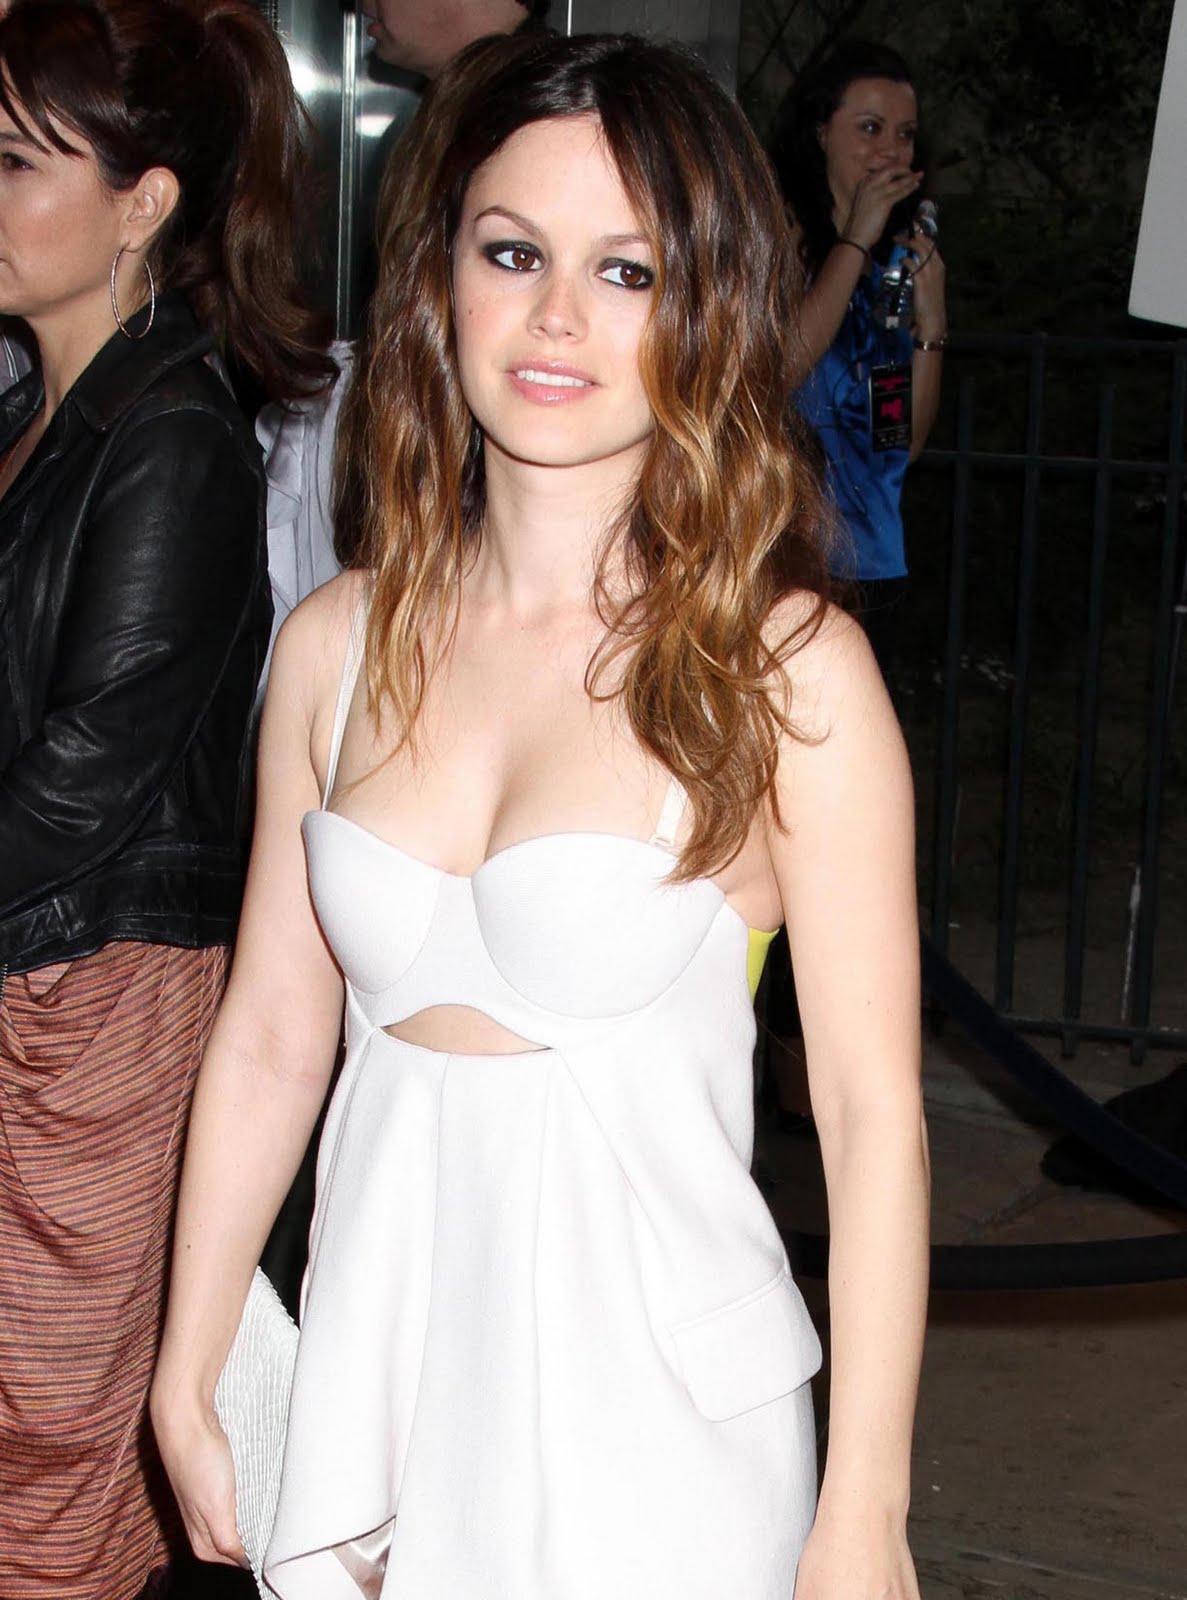 http://3.bp.blogspot.com/_D3aCB4CeW4c/S79DvmFv4XI/AAAAAAAAAOM/C2dLWgib-sE/s1600/rachel_bilson_white_dress_7.jpg